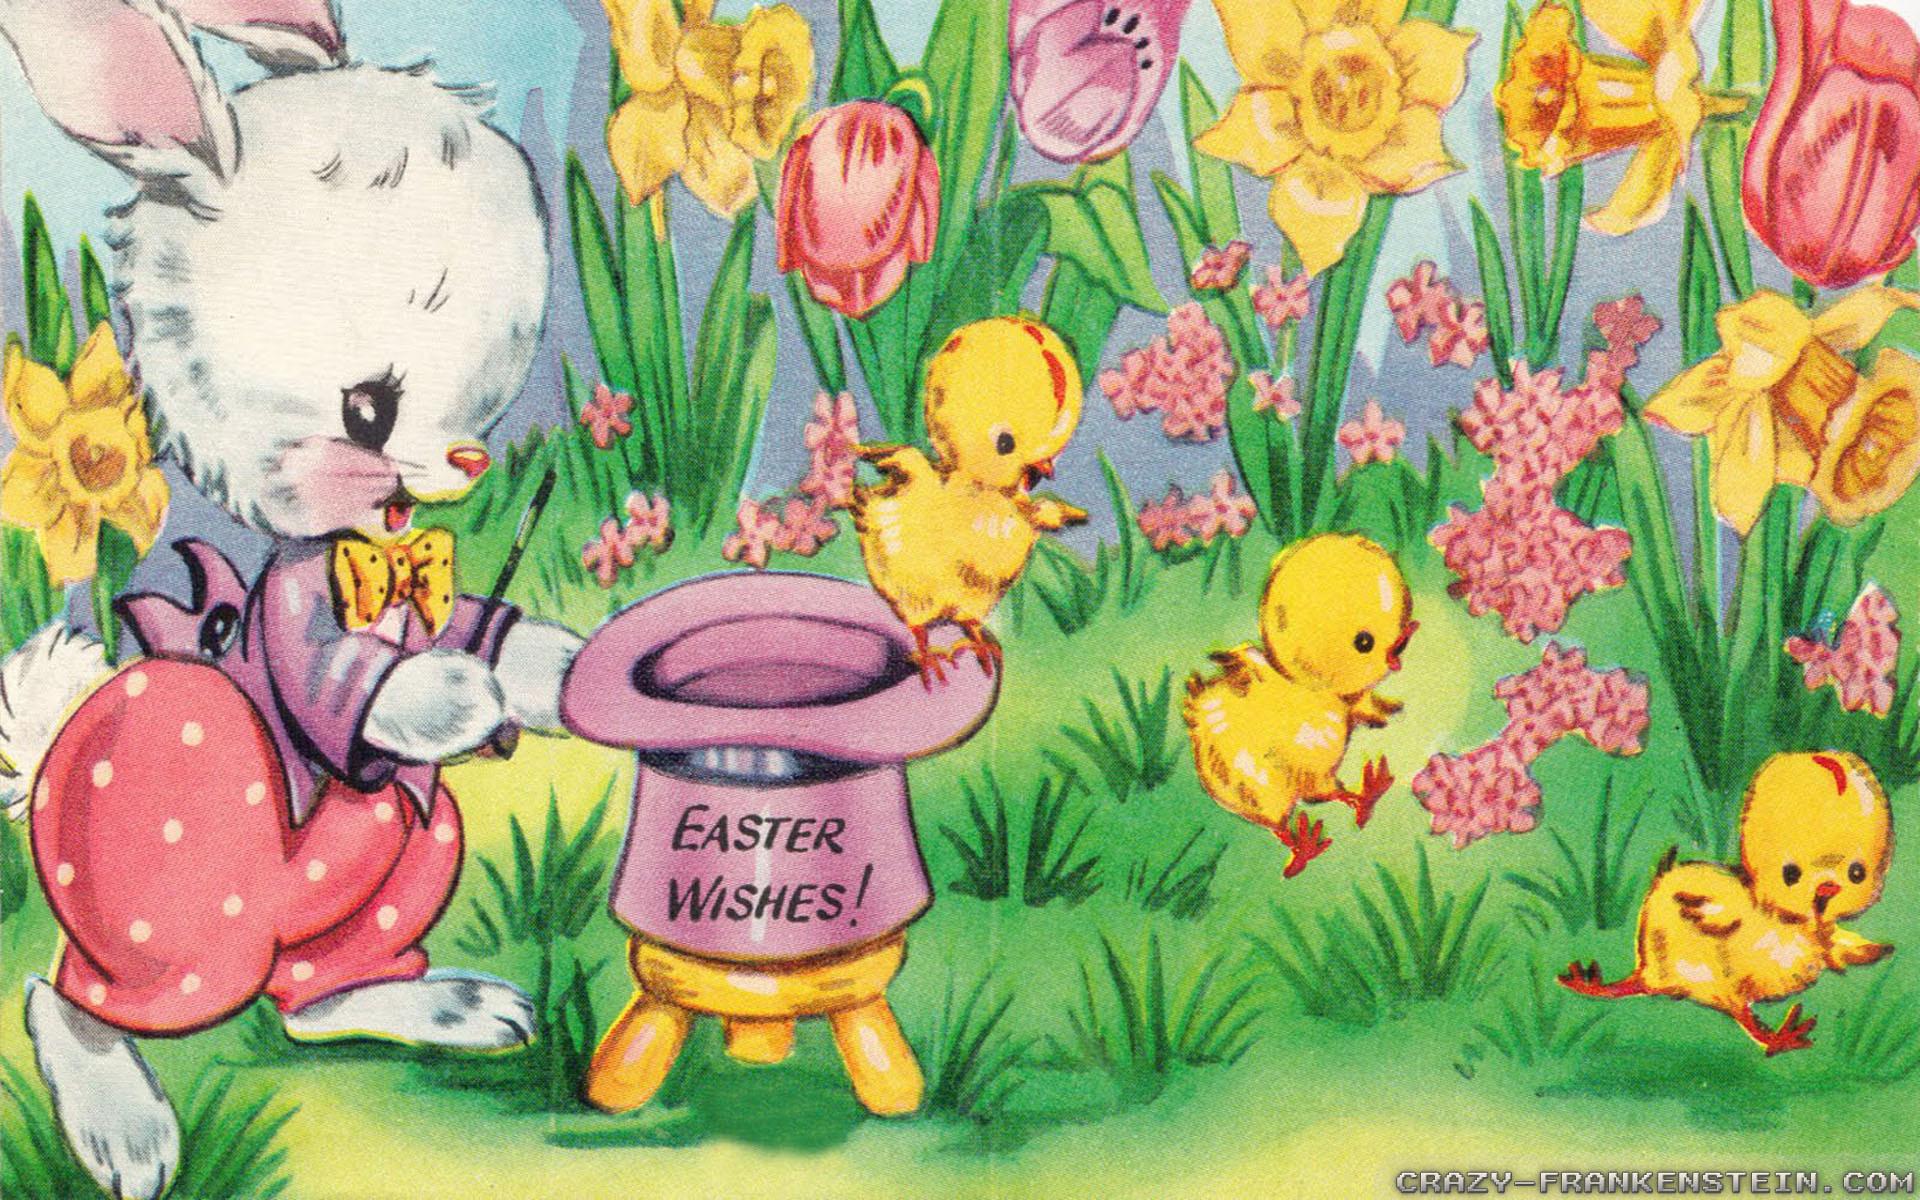 Beautiful Easter Desktop Wallpaper 74 images 1920x1200